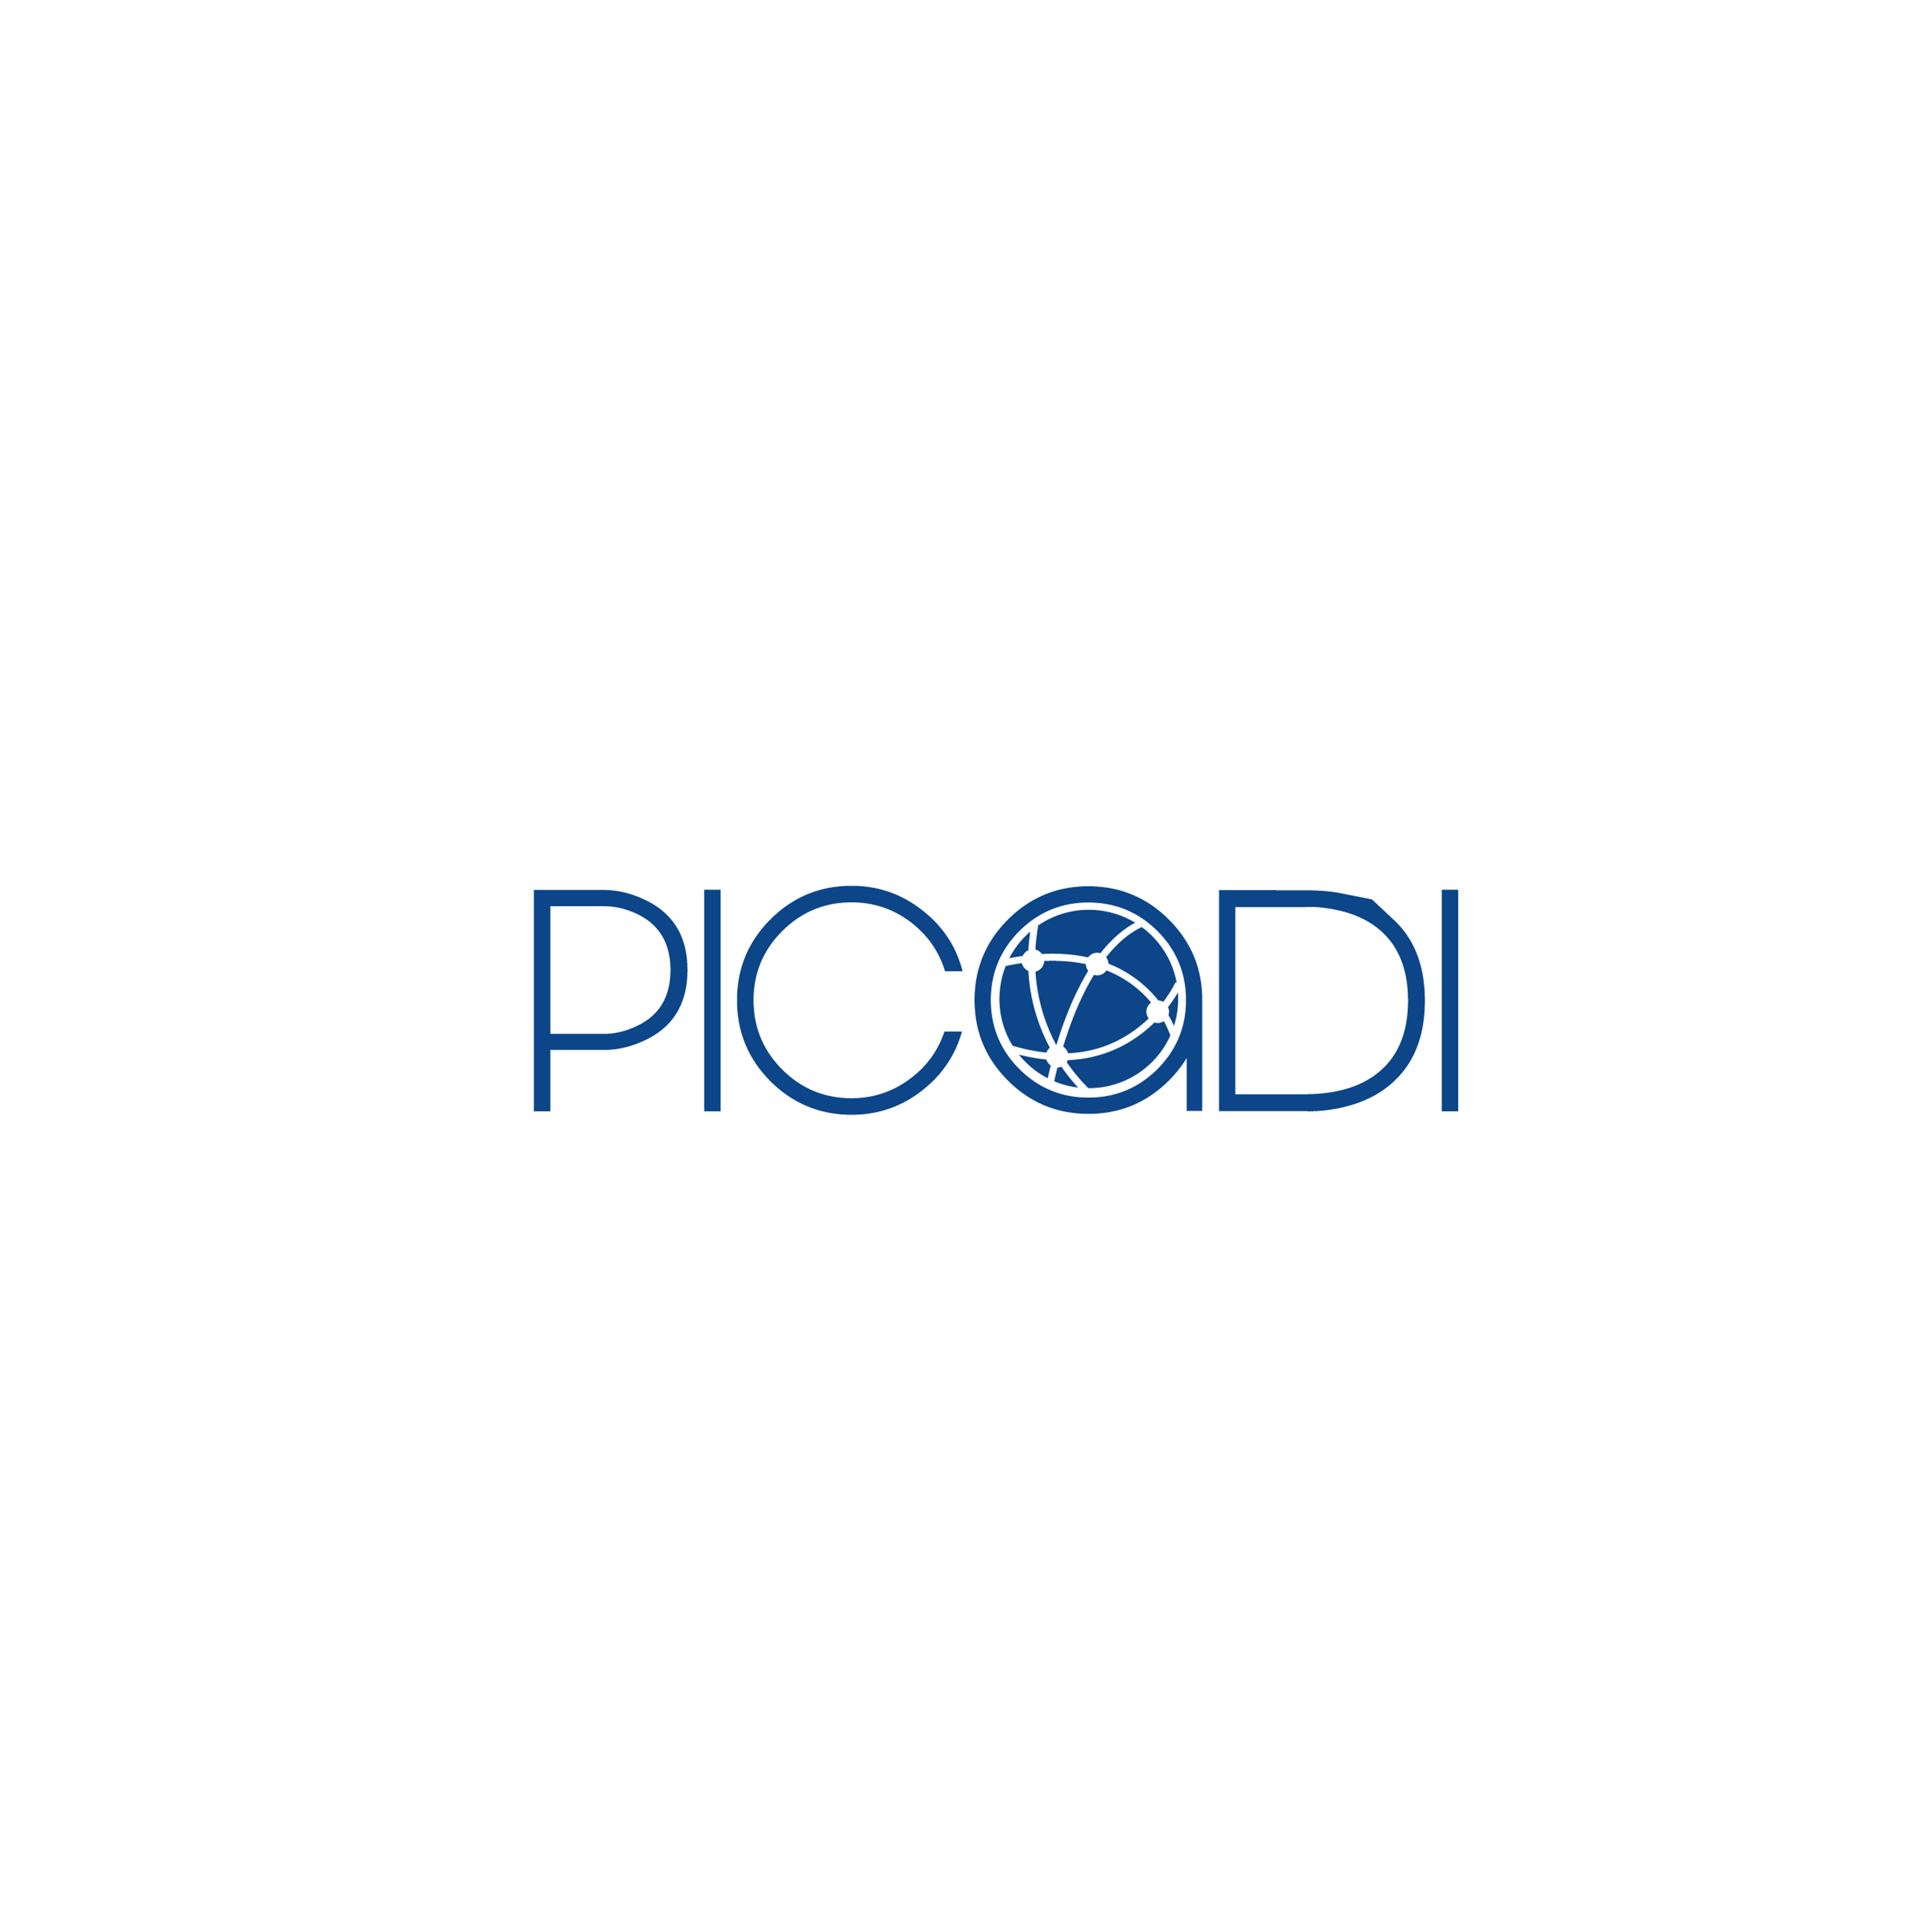 Picadi Logo Design